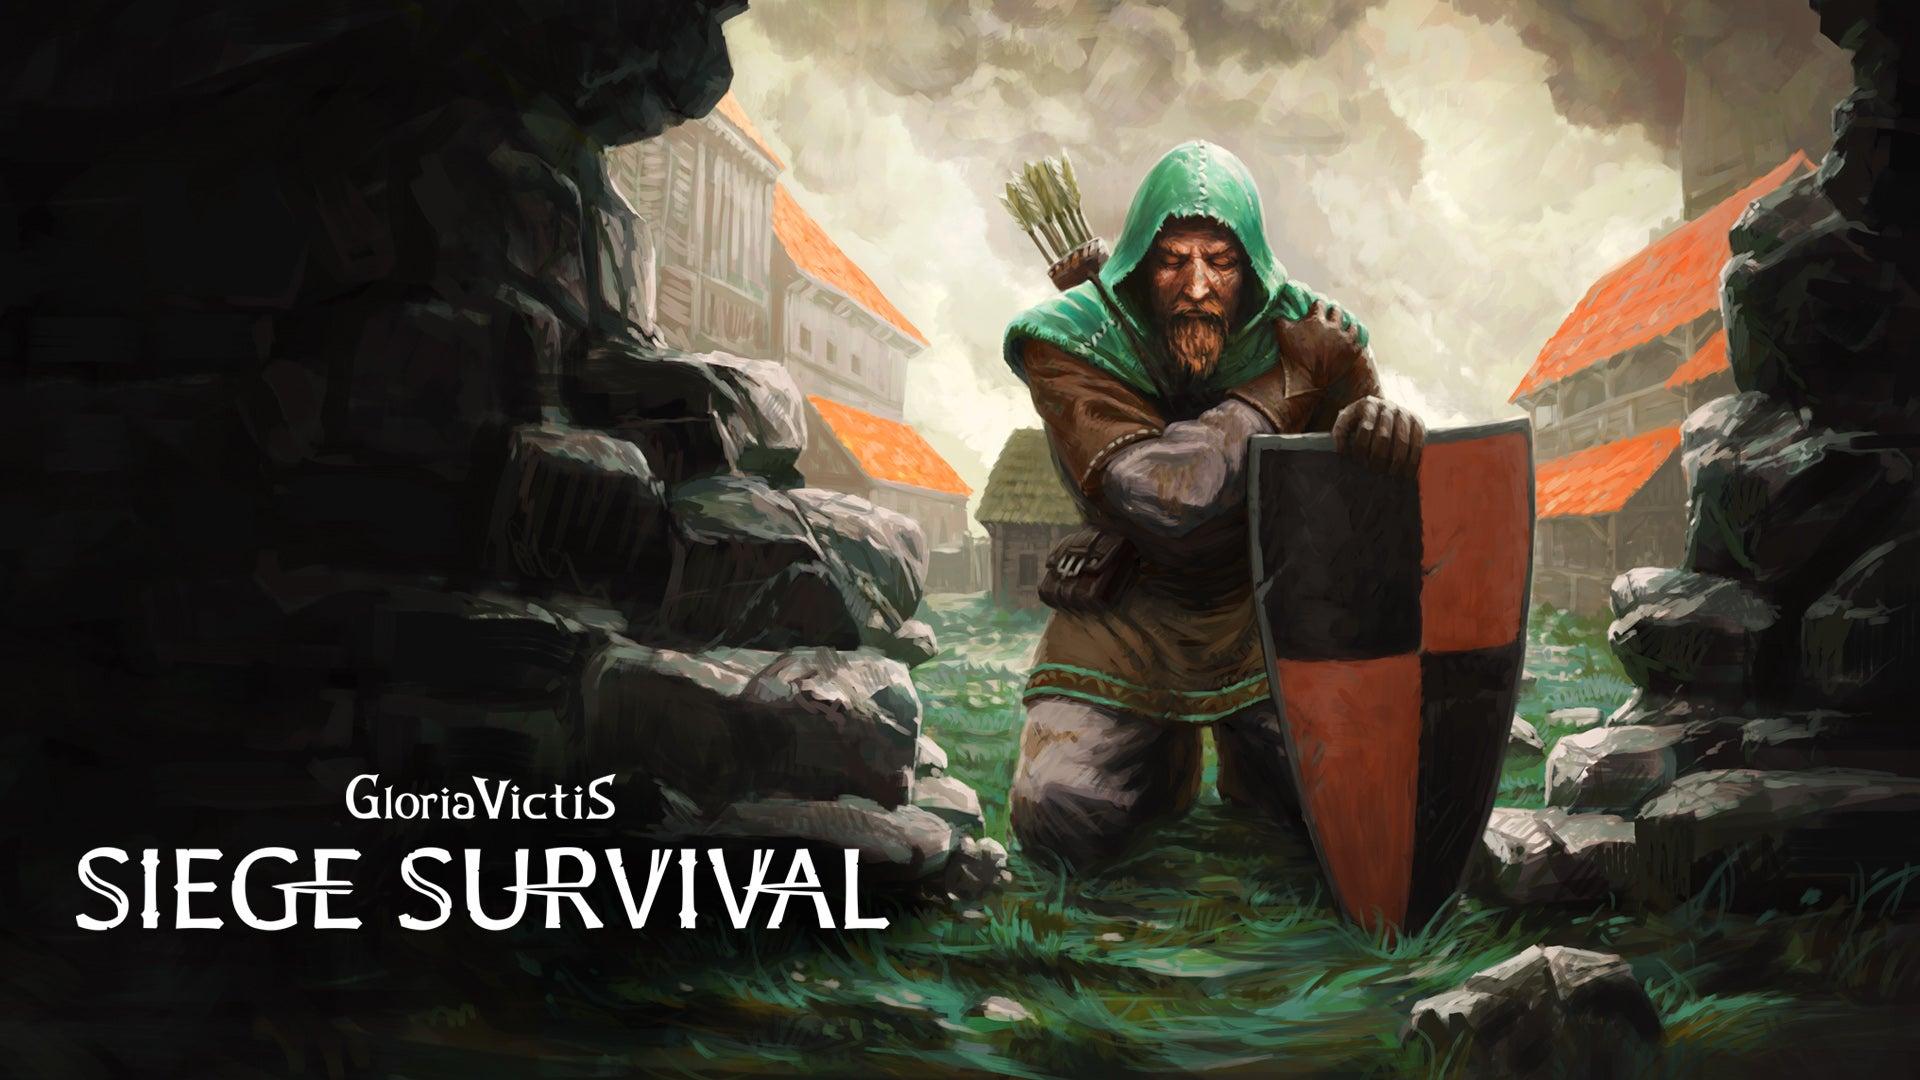 Screenshot of Siege Survival: Gloria Victis